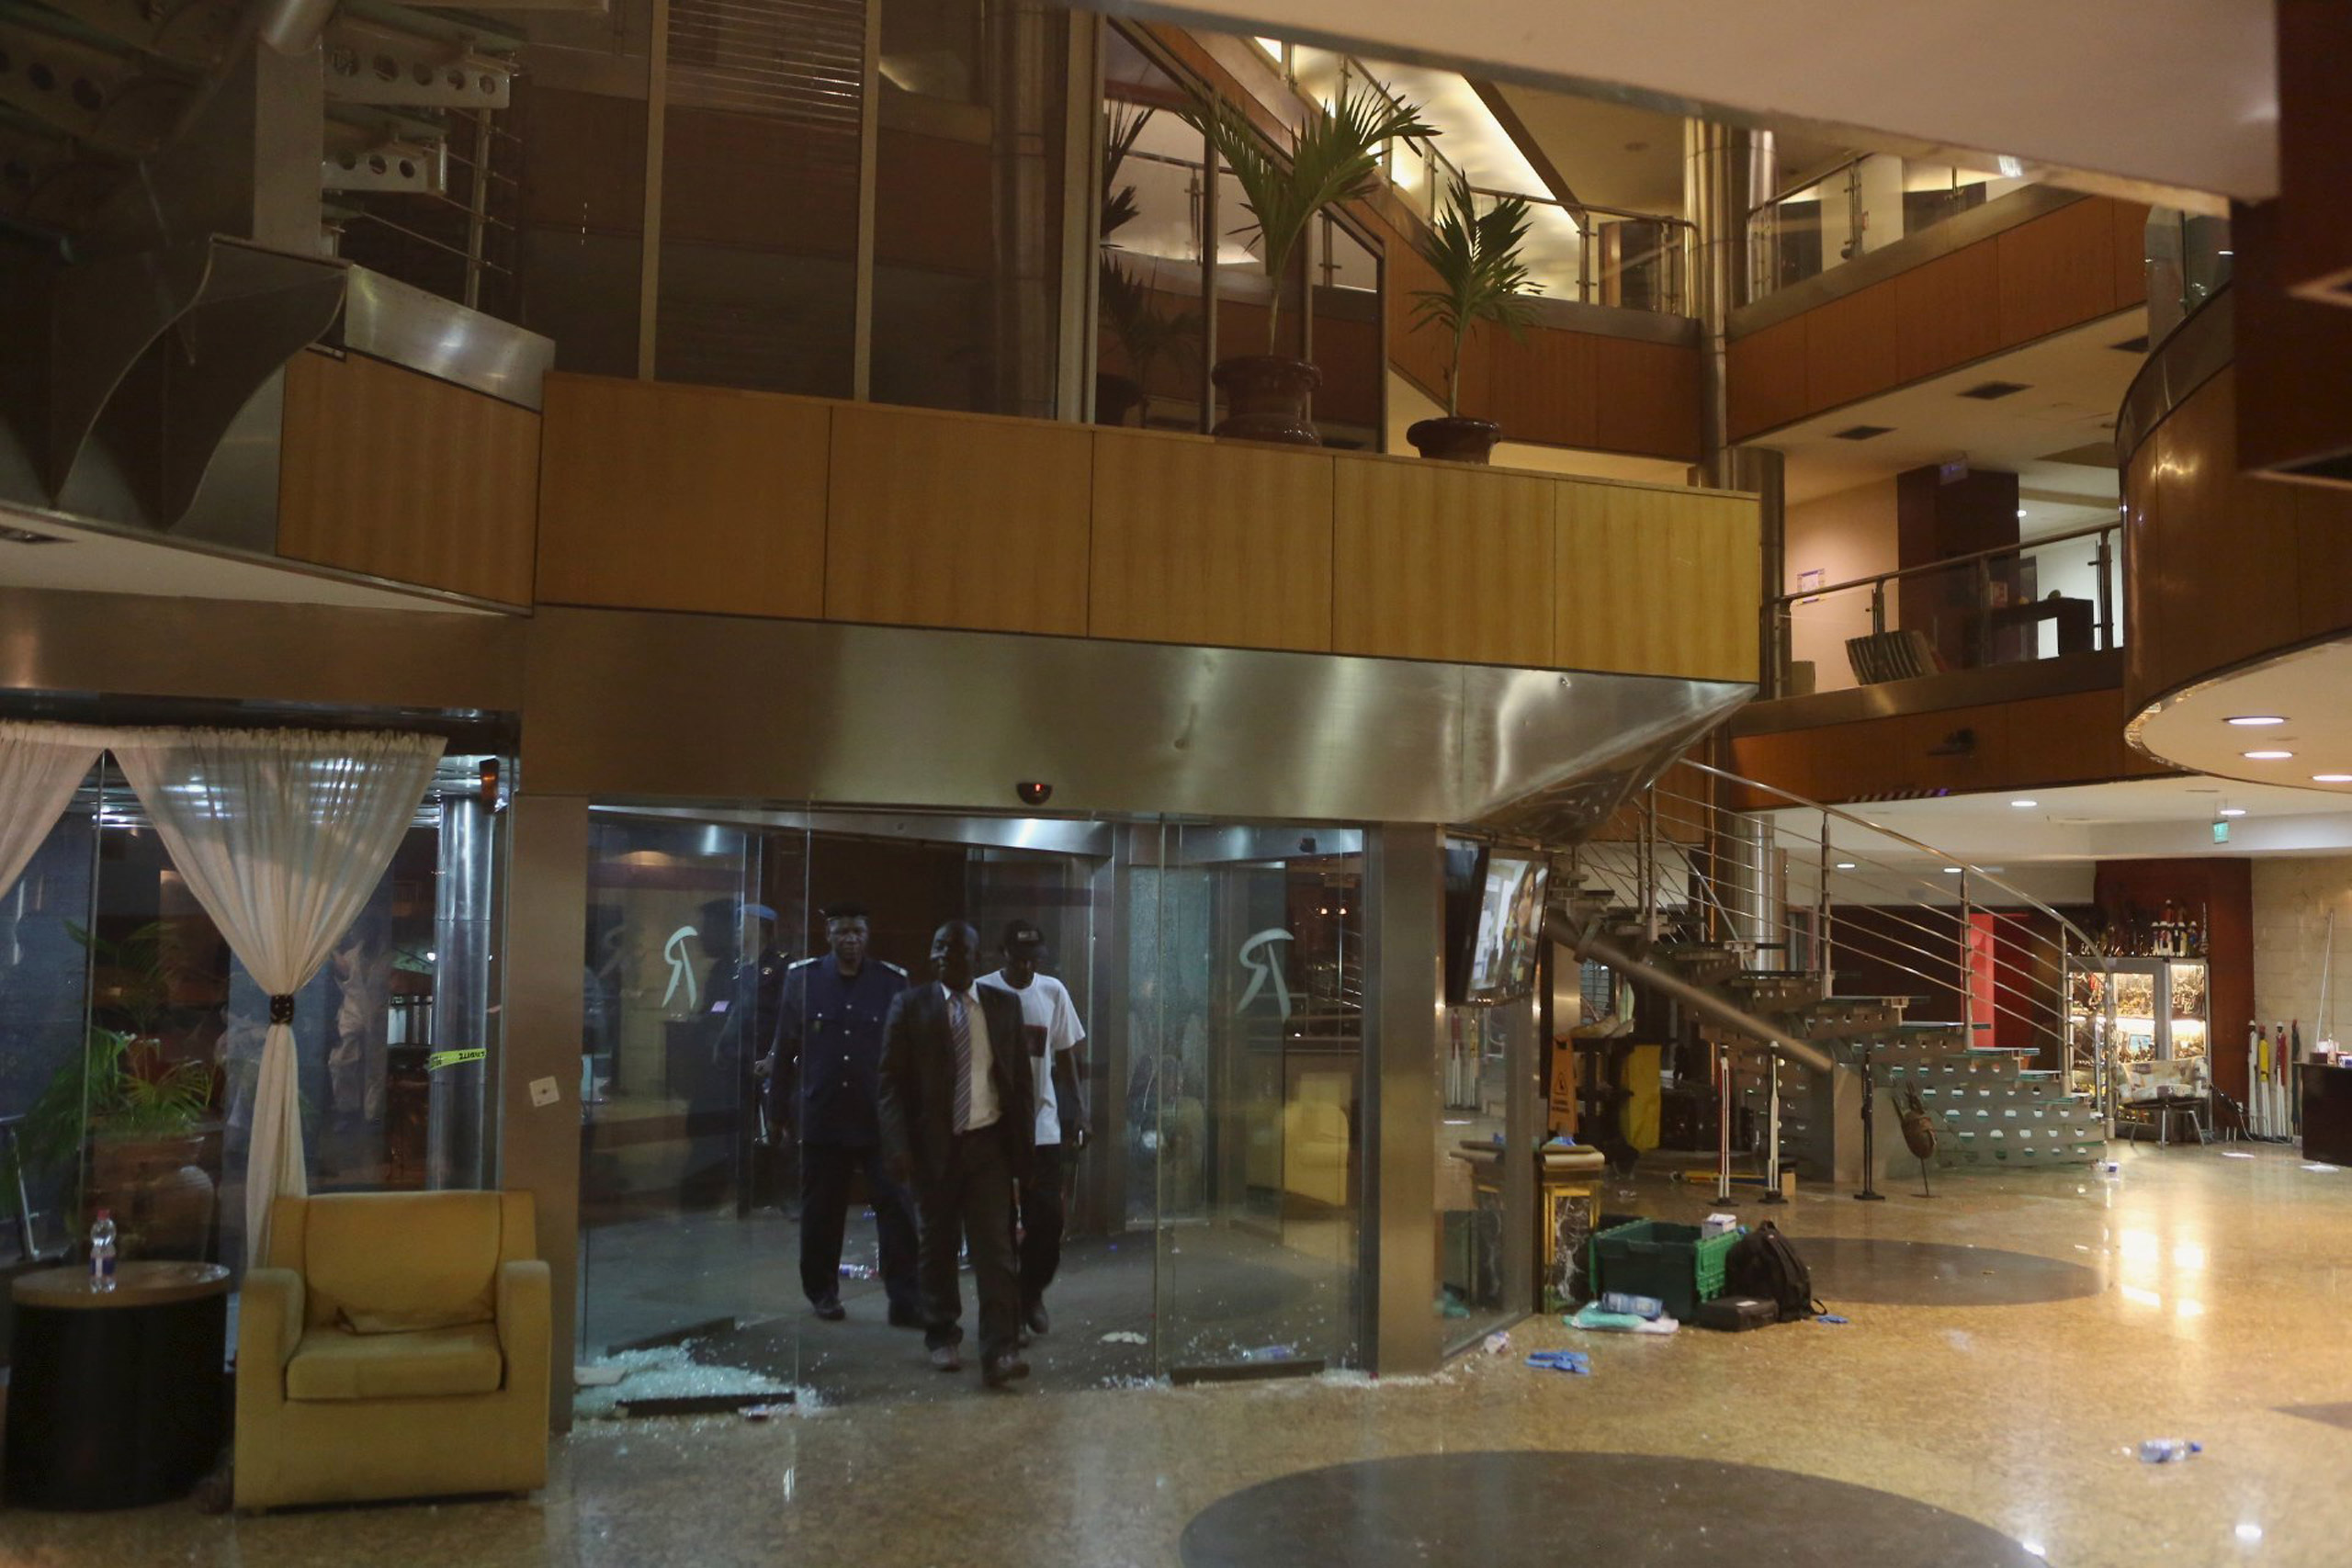 Malian officials enter the lobby of the Radisson hotel in Bamako, Mali, on Nov. 20, 2015.